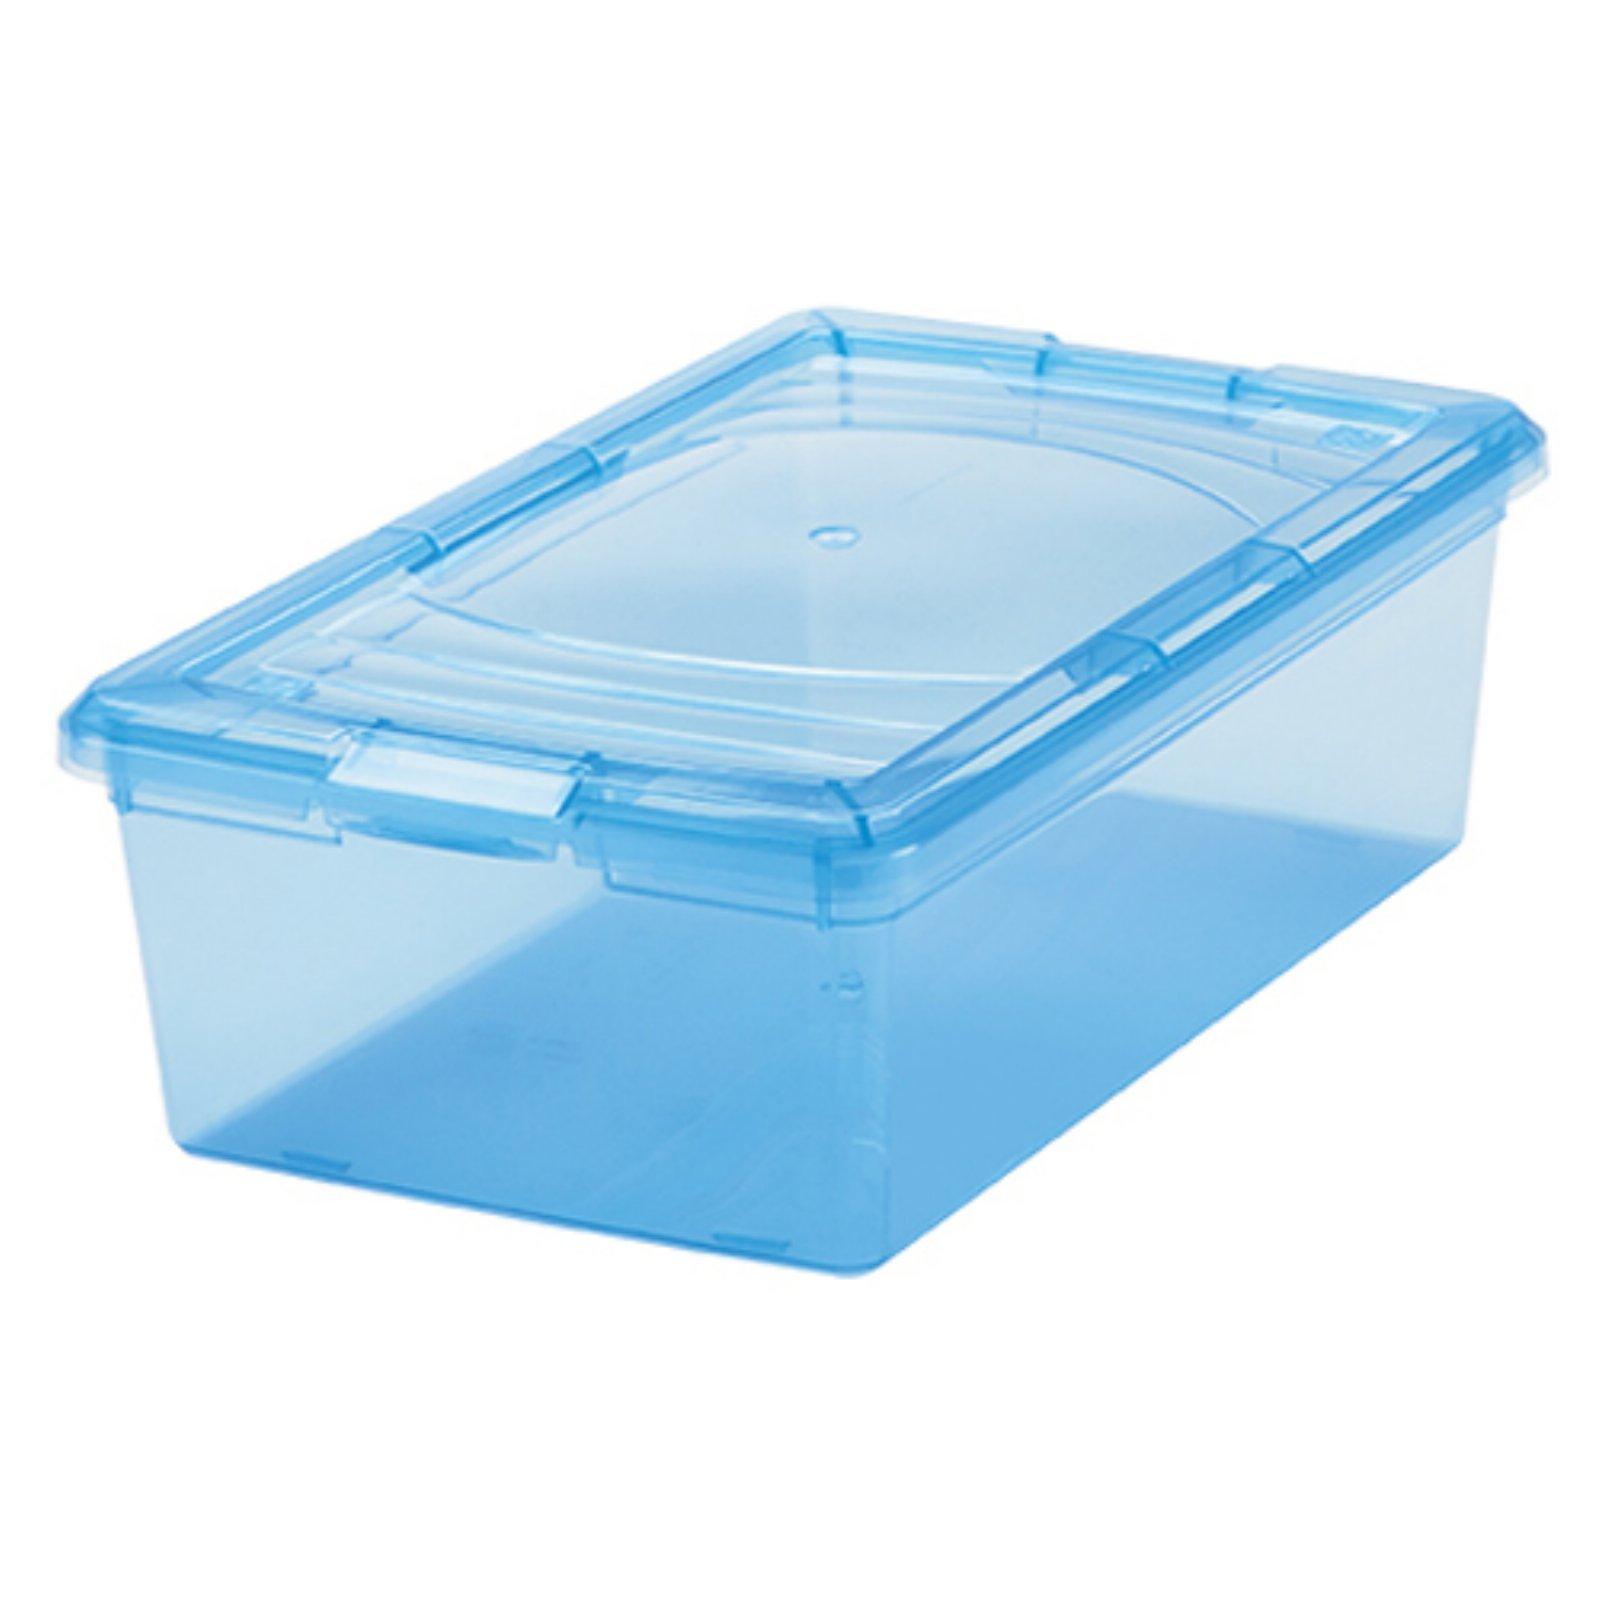 IRIS 34 Quart Deep Sweater Storage Box, 10 Pack, Soft Blue